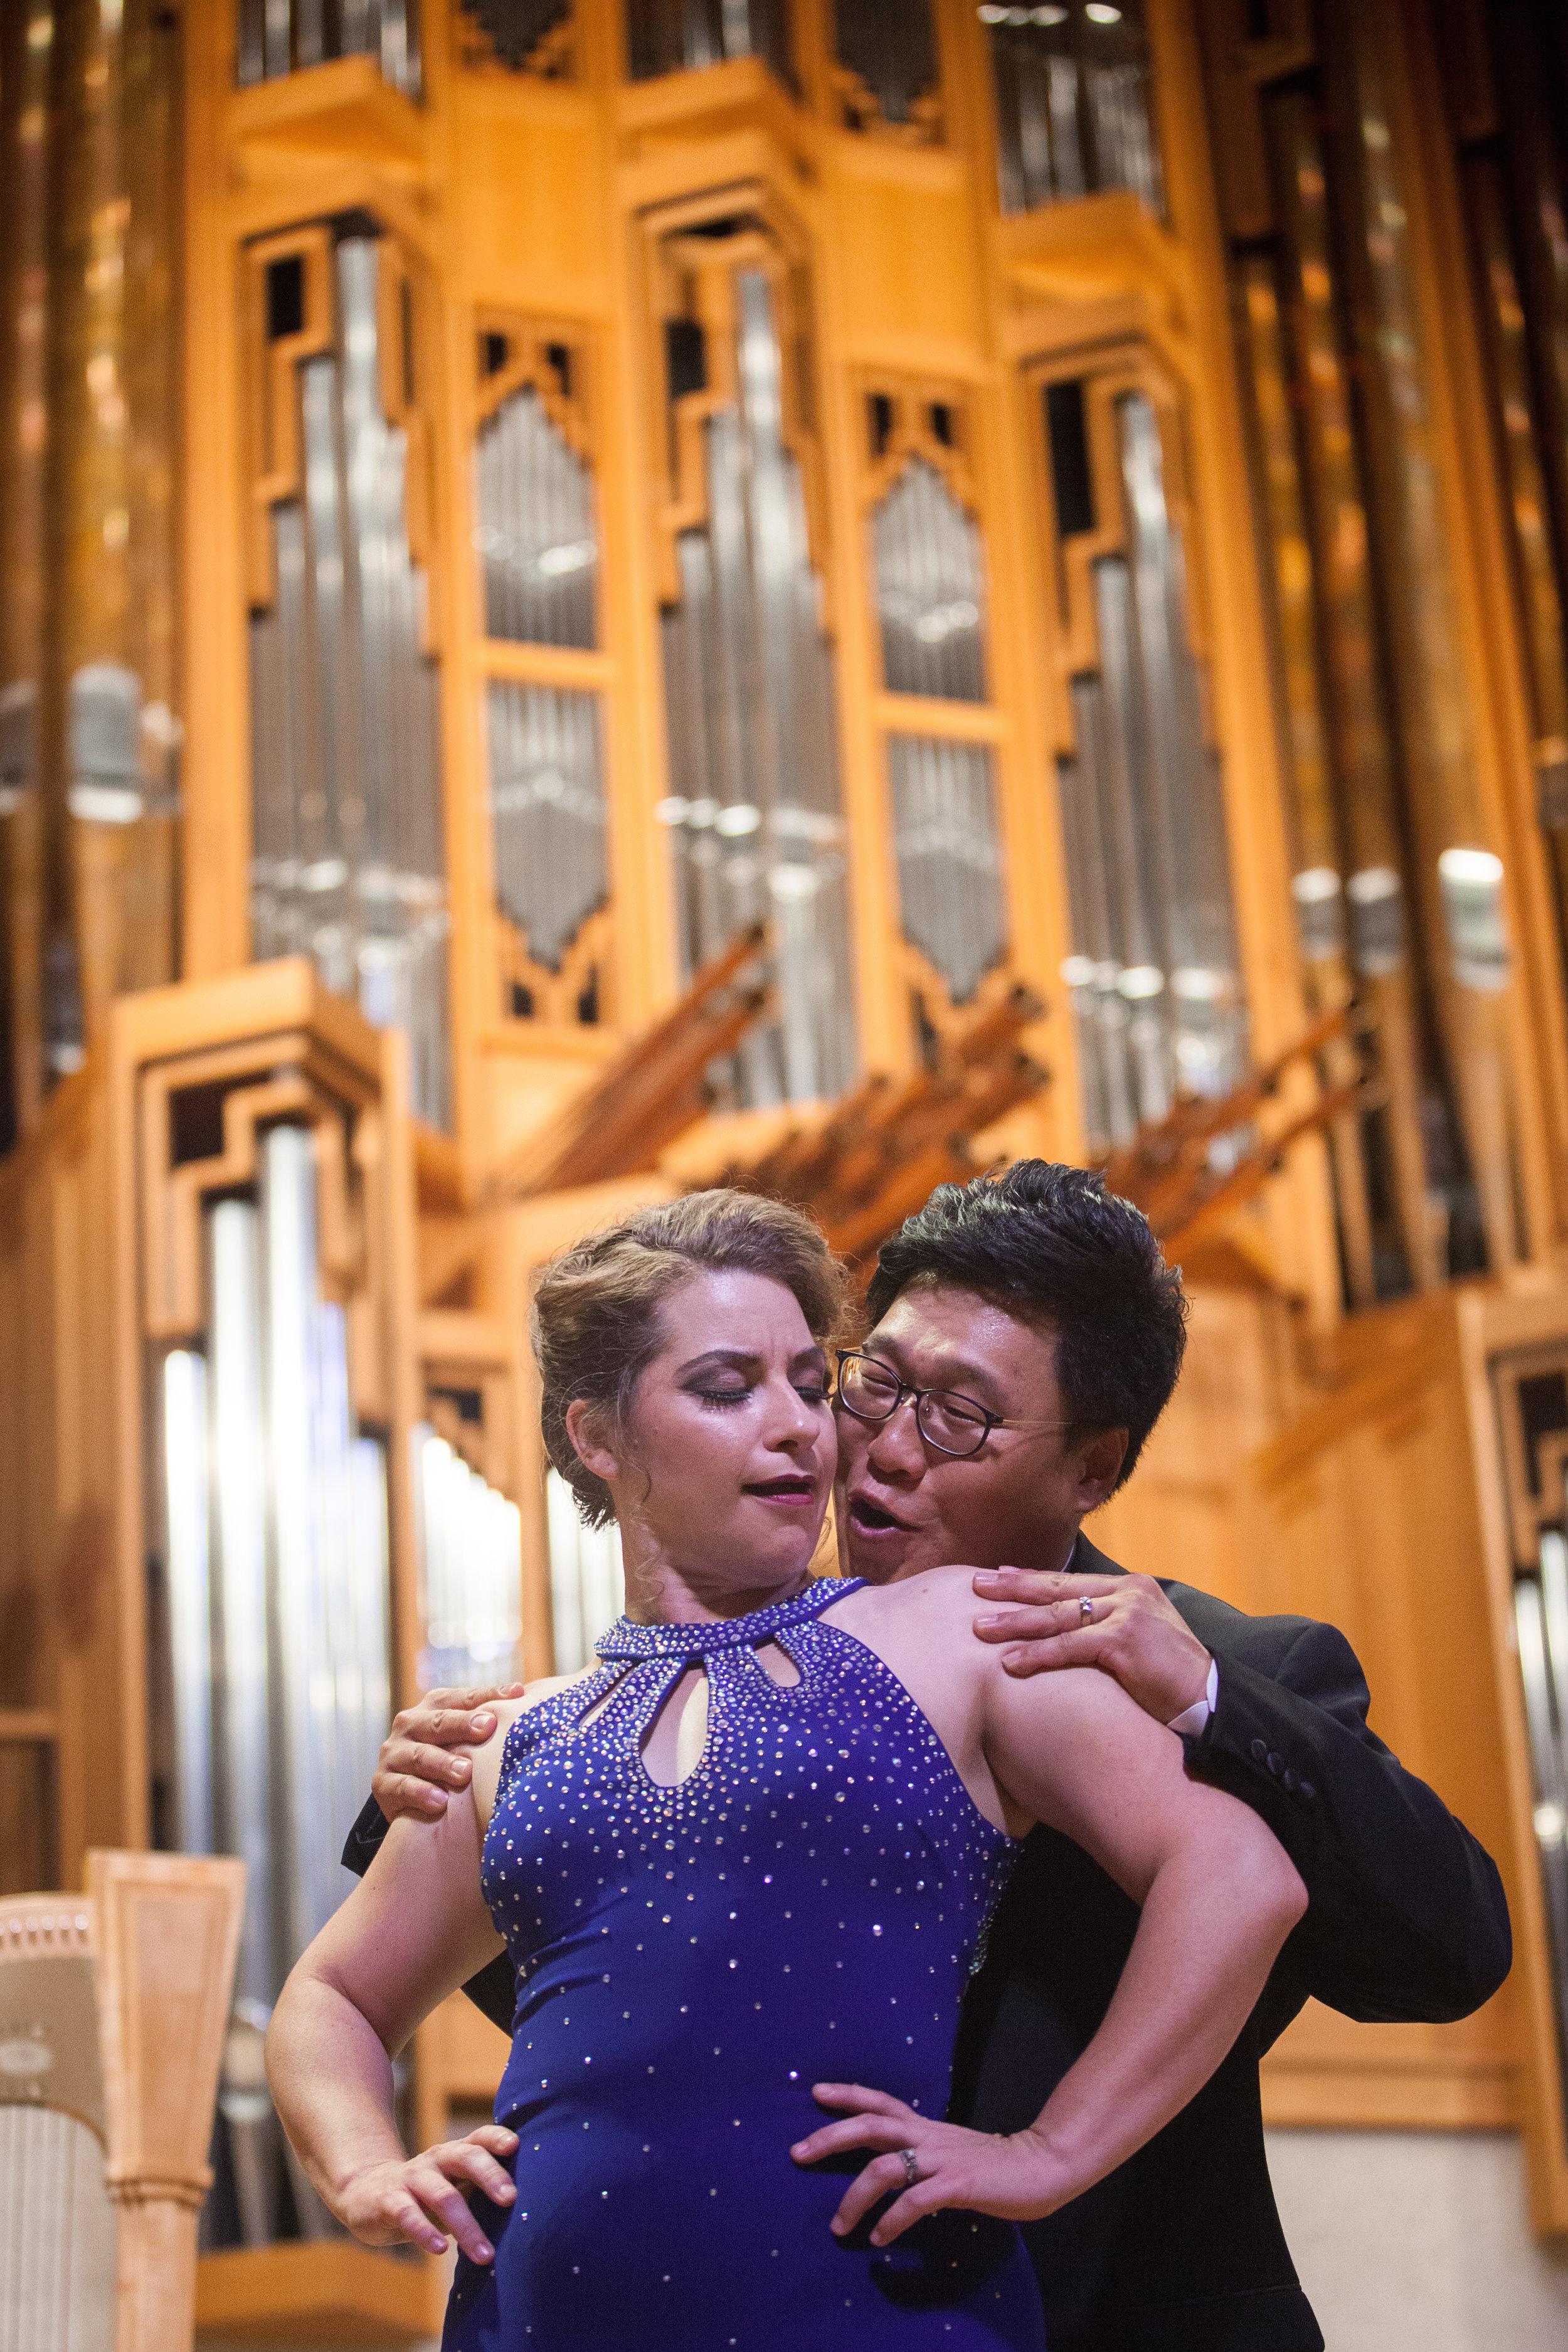 Soonchan Kwon, tenor, and Ellie Jarrett-Shattles, mezzo-soprano, singing a duet.